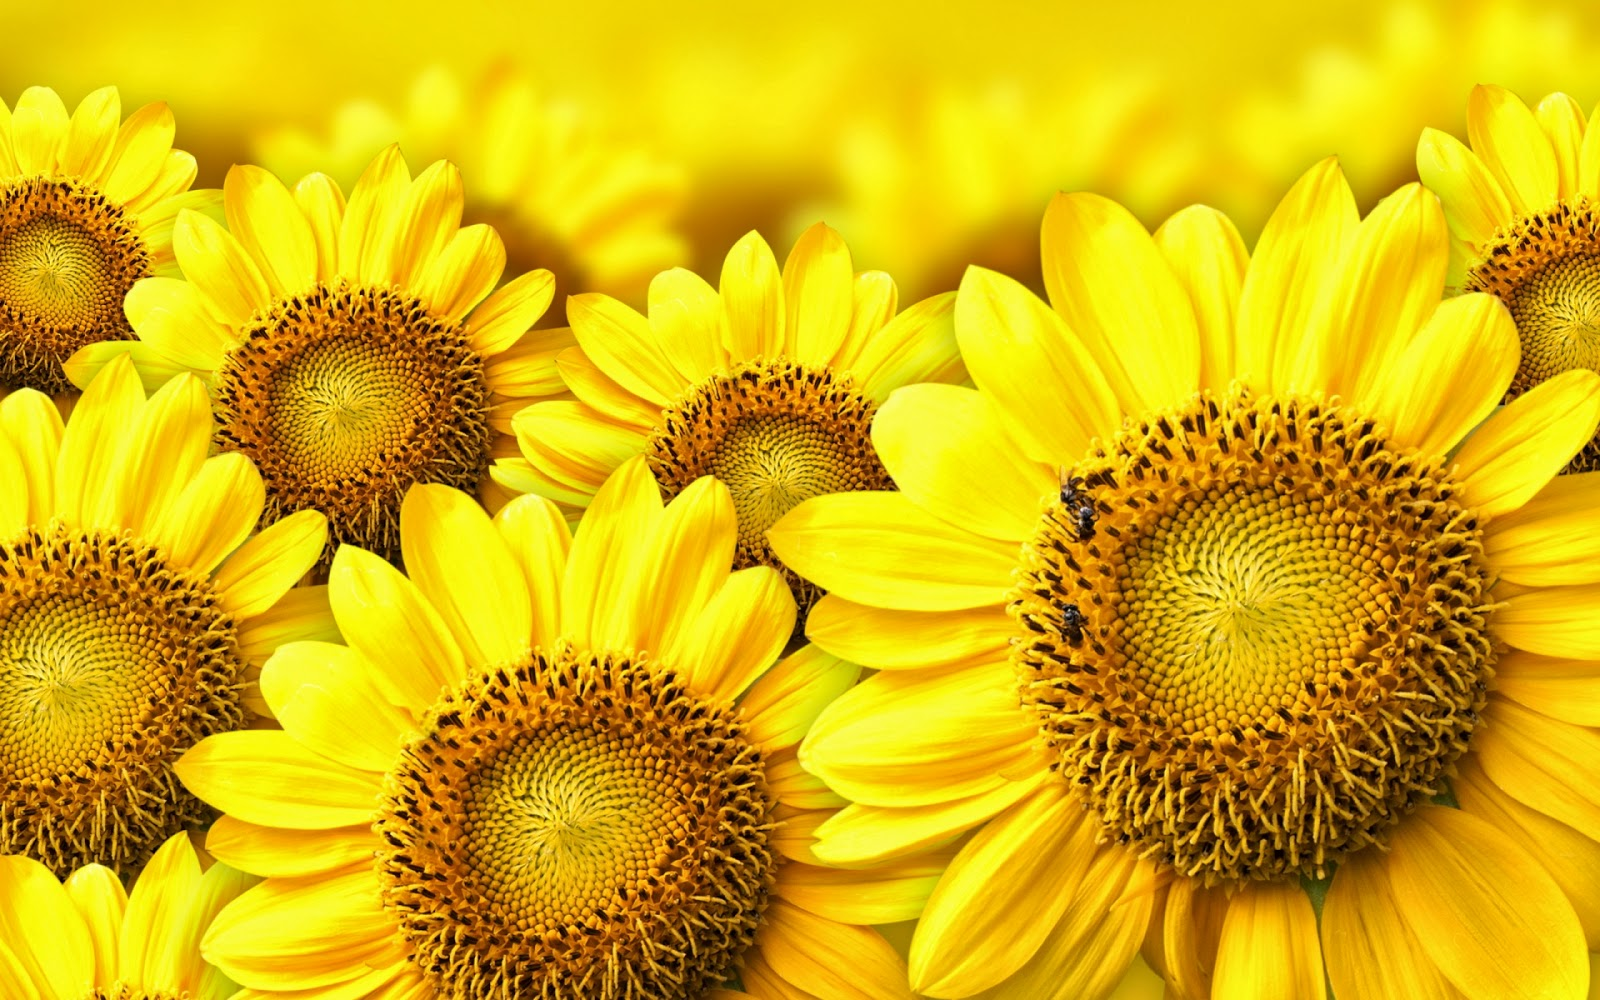 10 Wallpaper Bunga Matahari | Deloiz Wallpaper